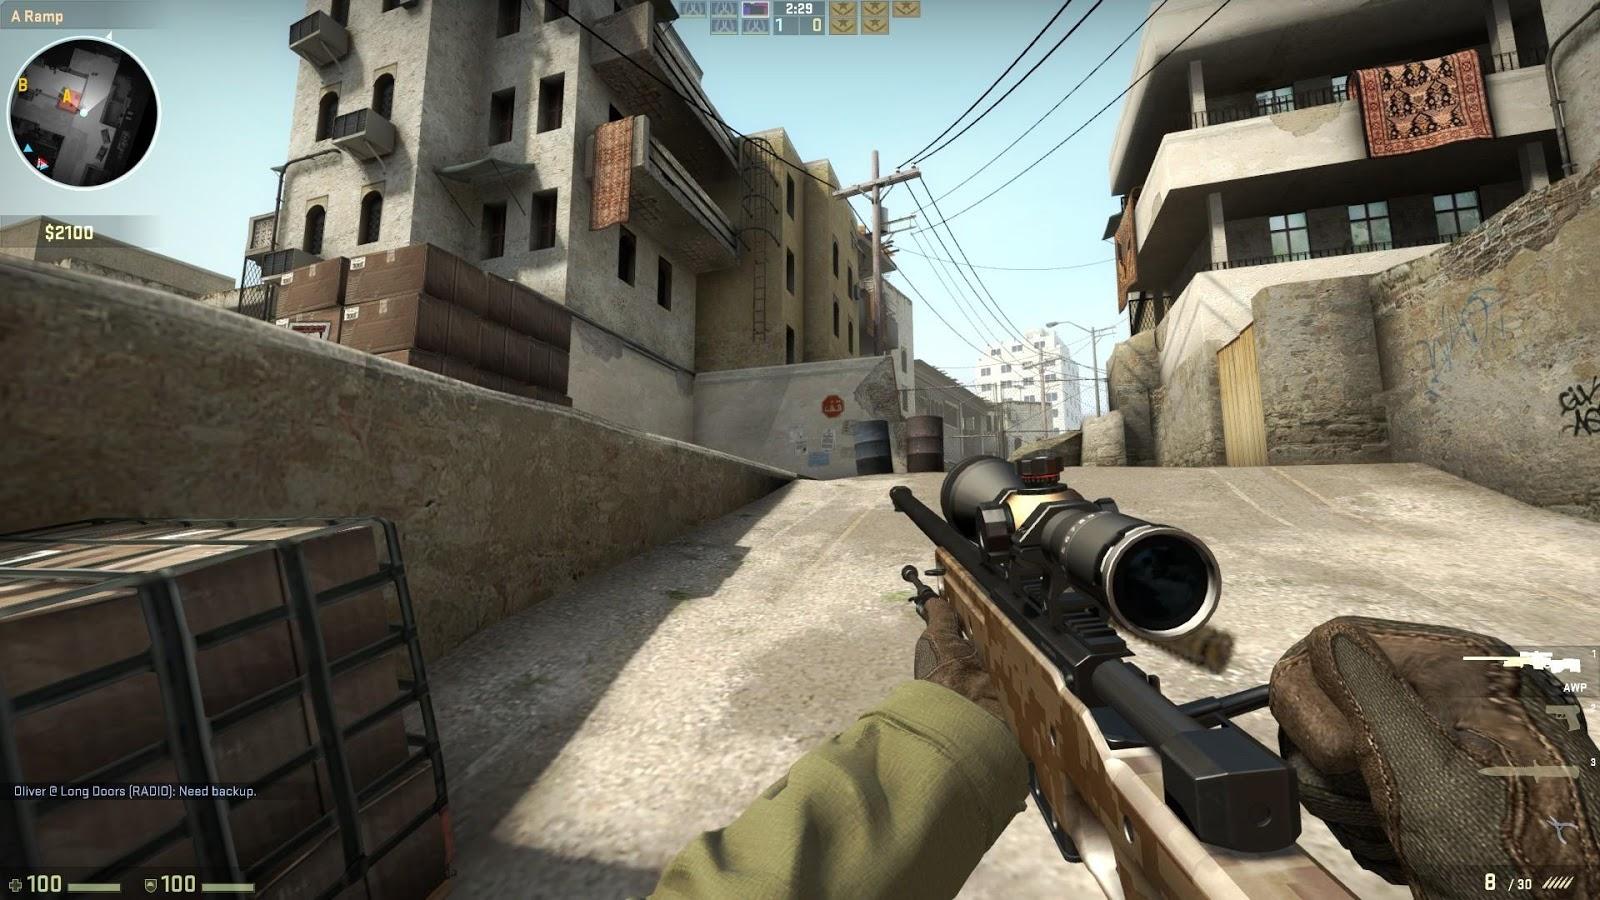 CSGOF rifle